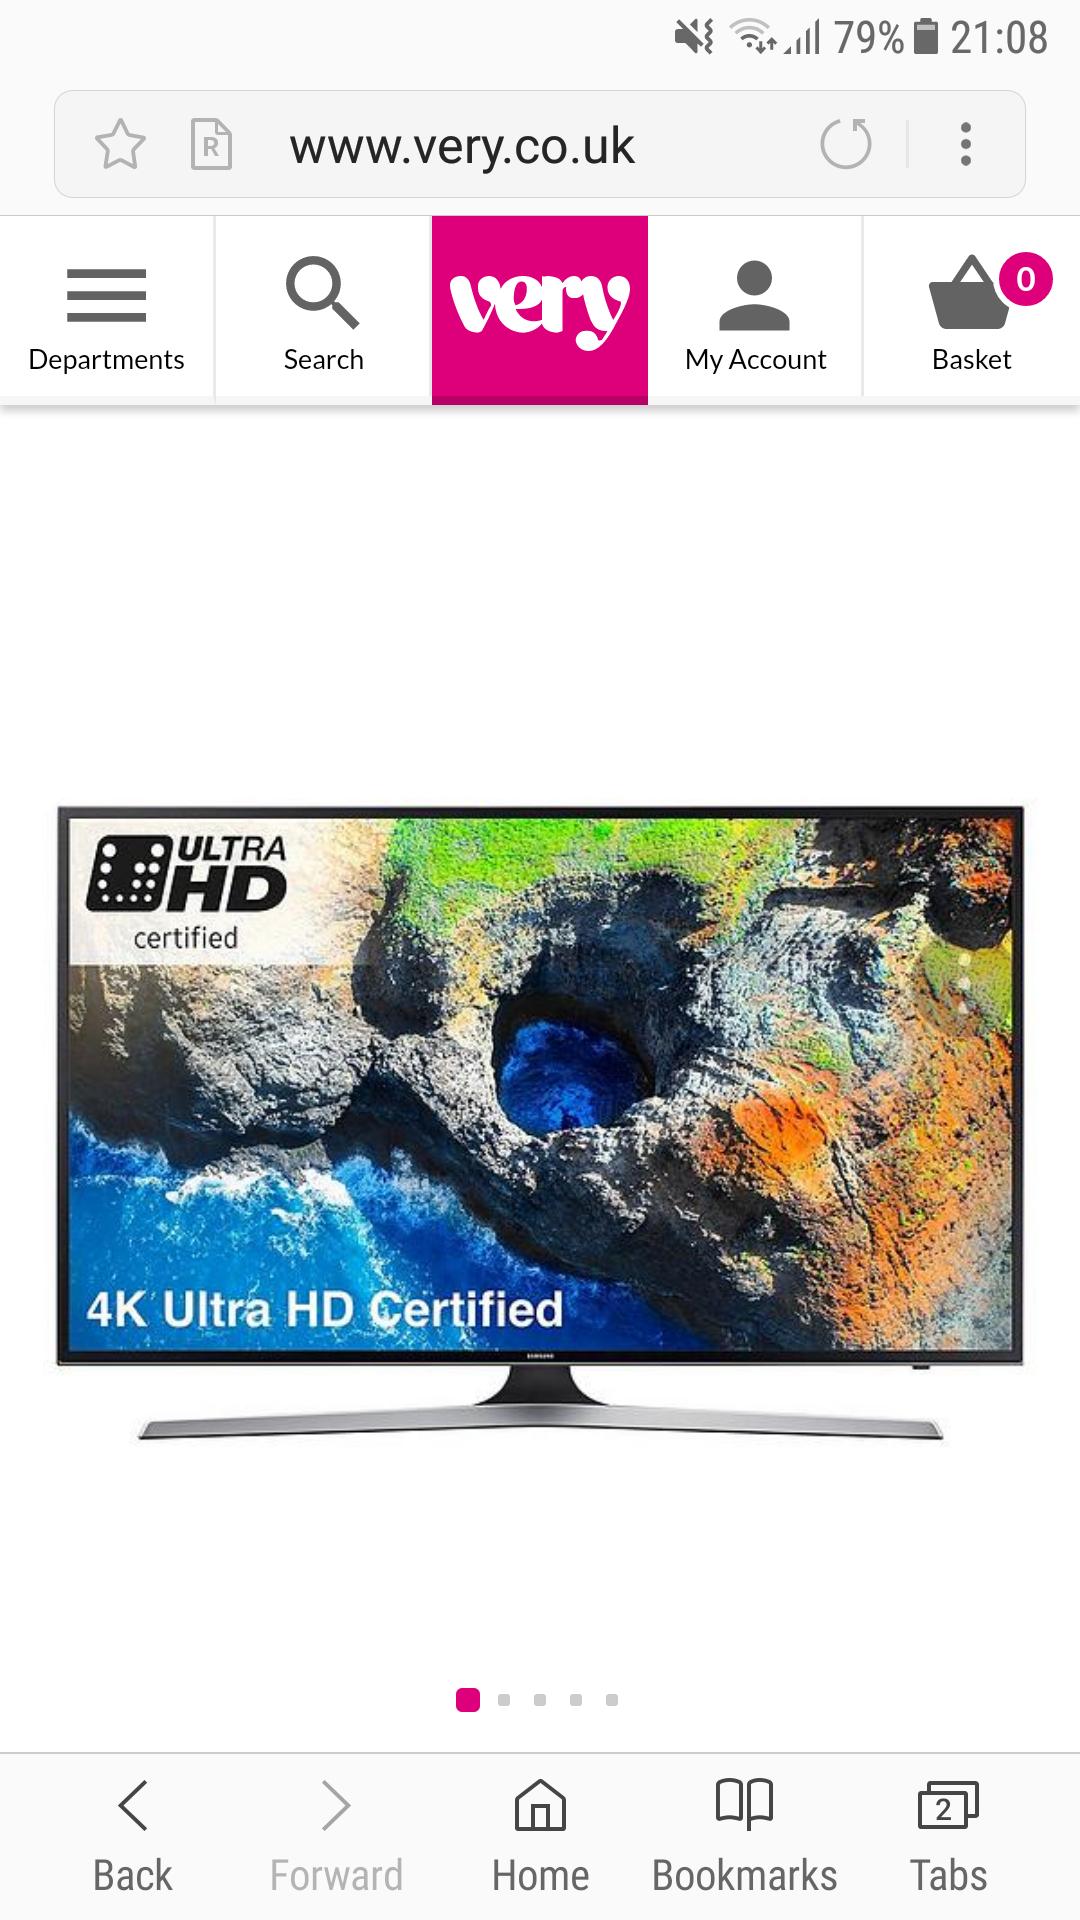 Samsung 4k tv 55 inch certified smart tv - £549 @ Very